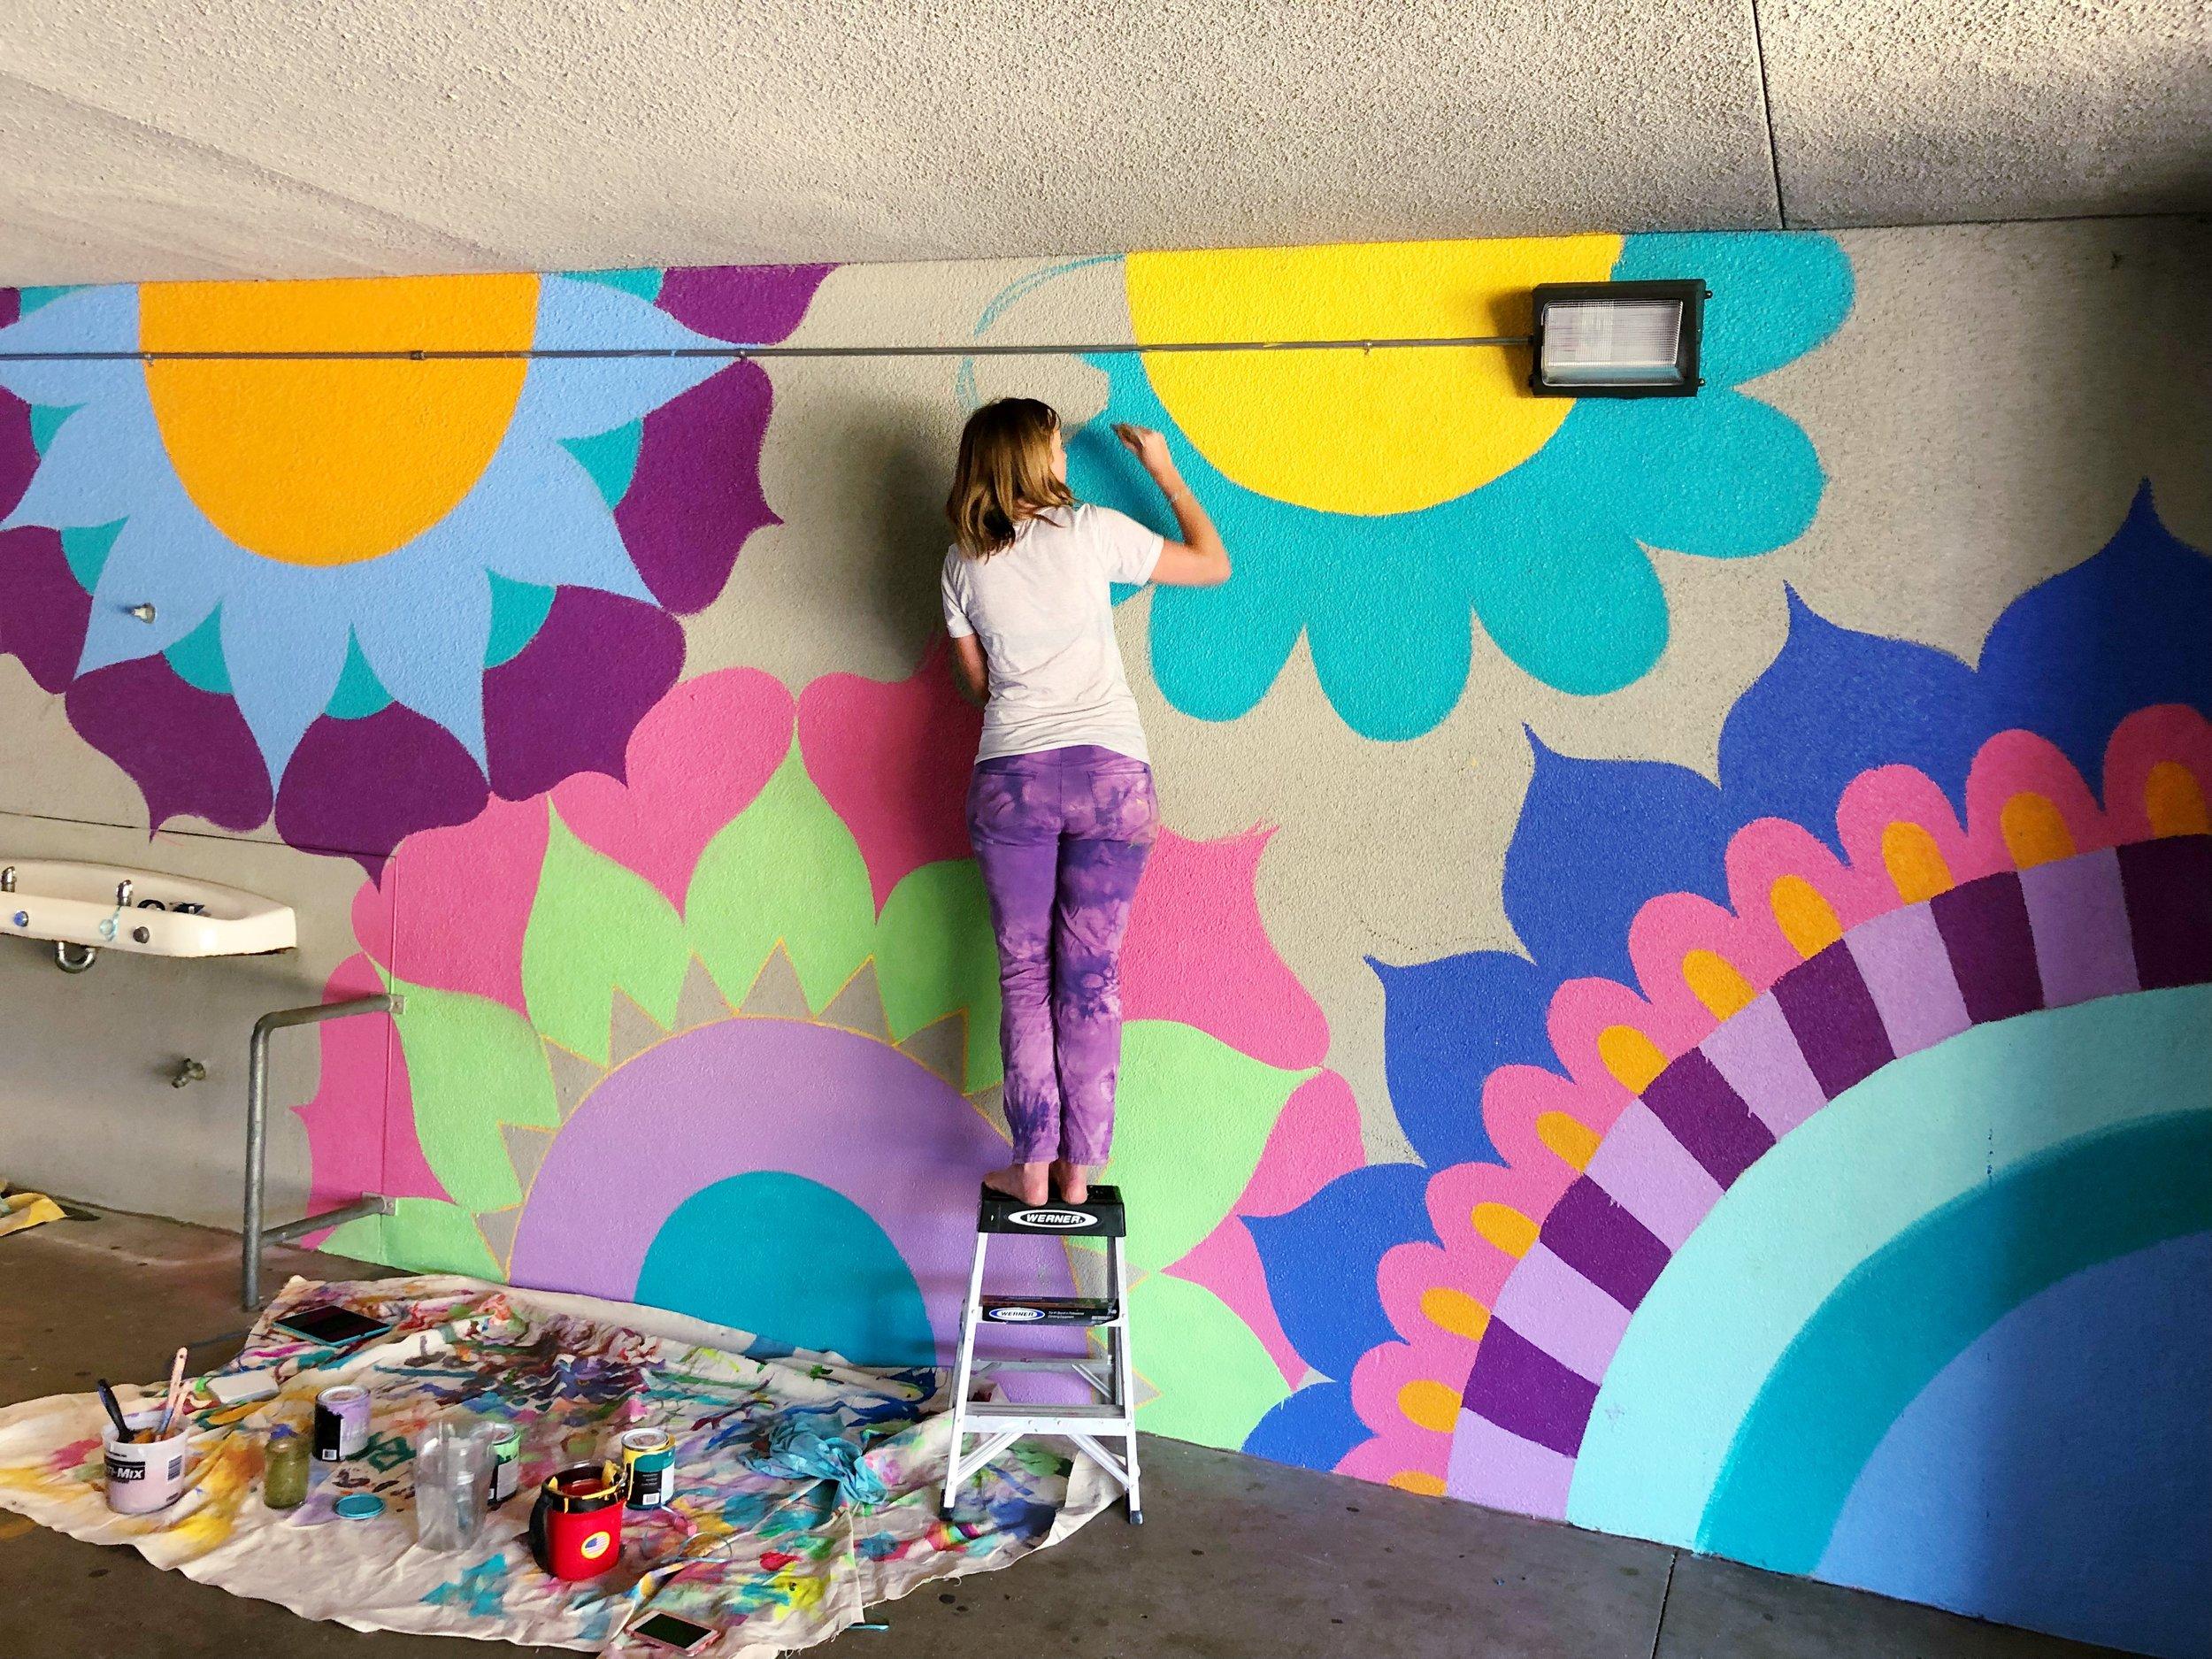 Mural at Muirlands Middle School, La Jolla, San Diego, 2018